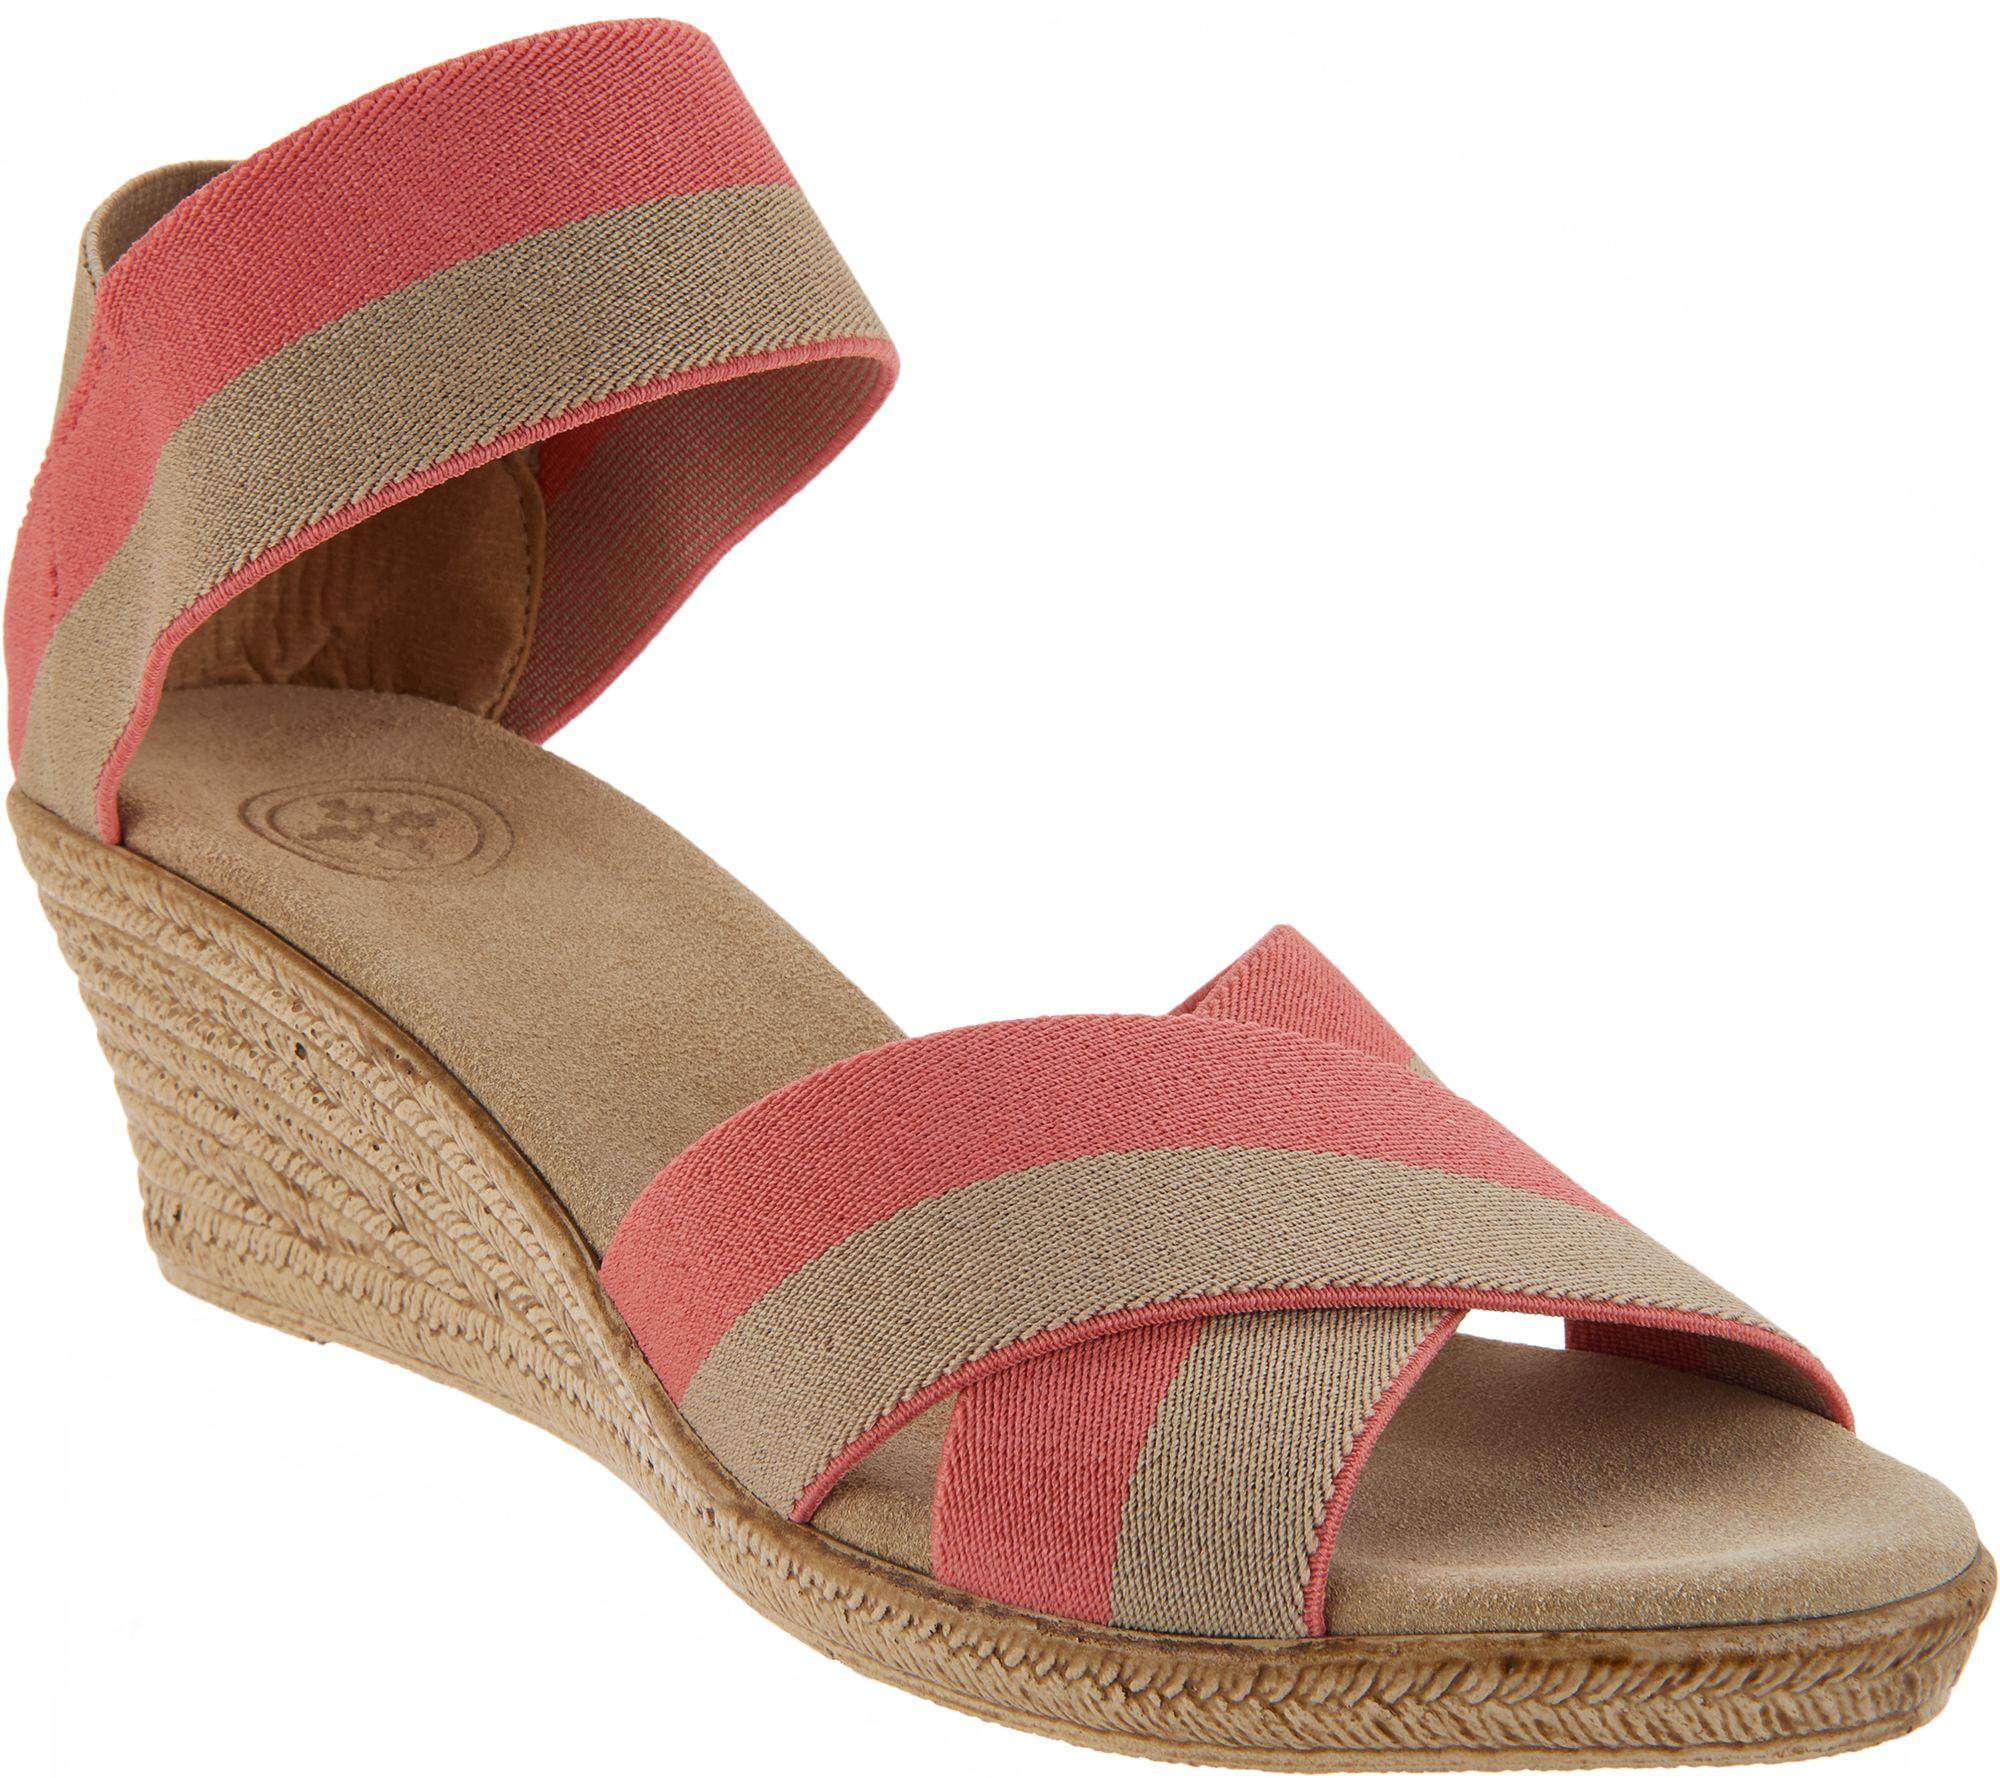 0e3ba034d13 Charleston Shoe Co. Stretch Wedge Sandals - Cannon - Page 1 — QVC.com